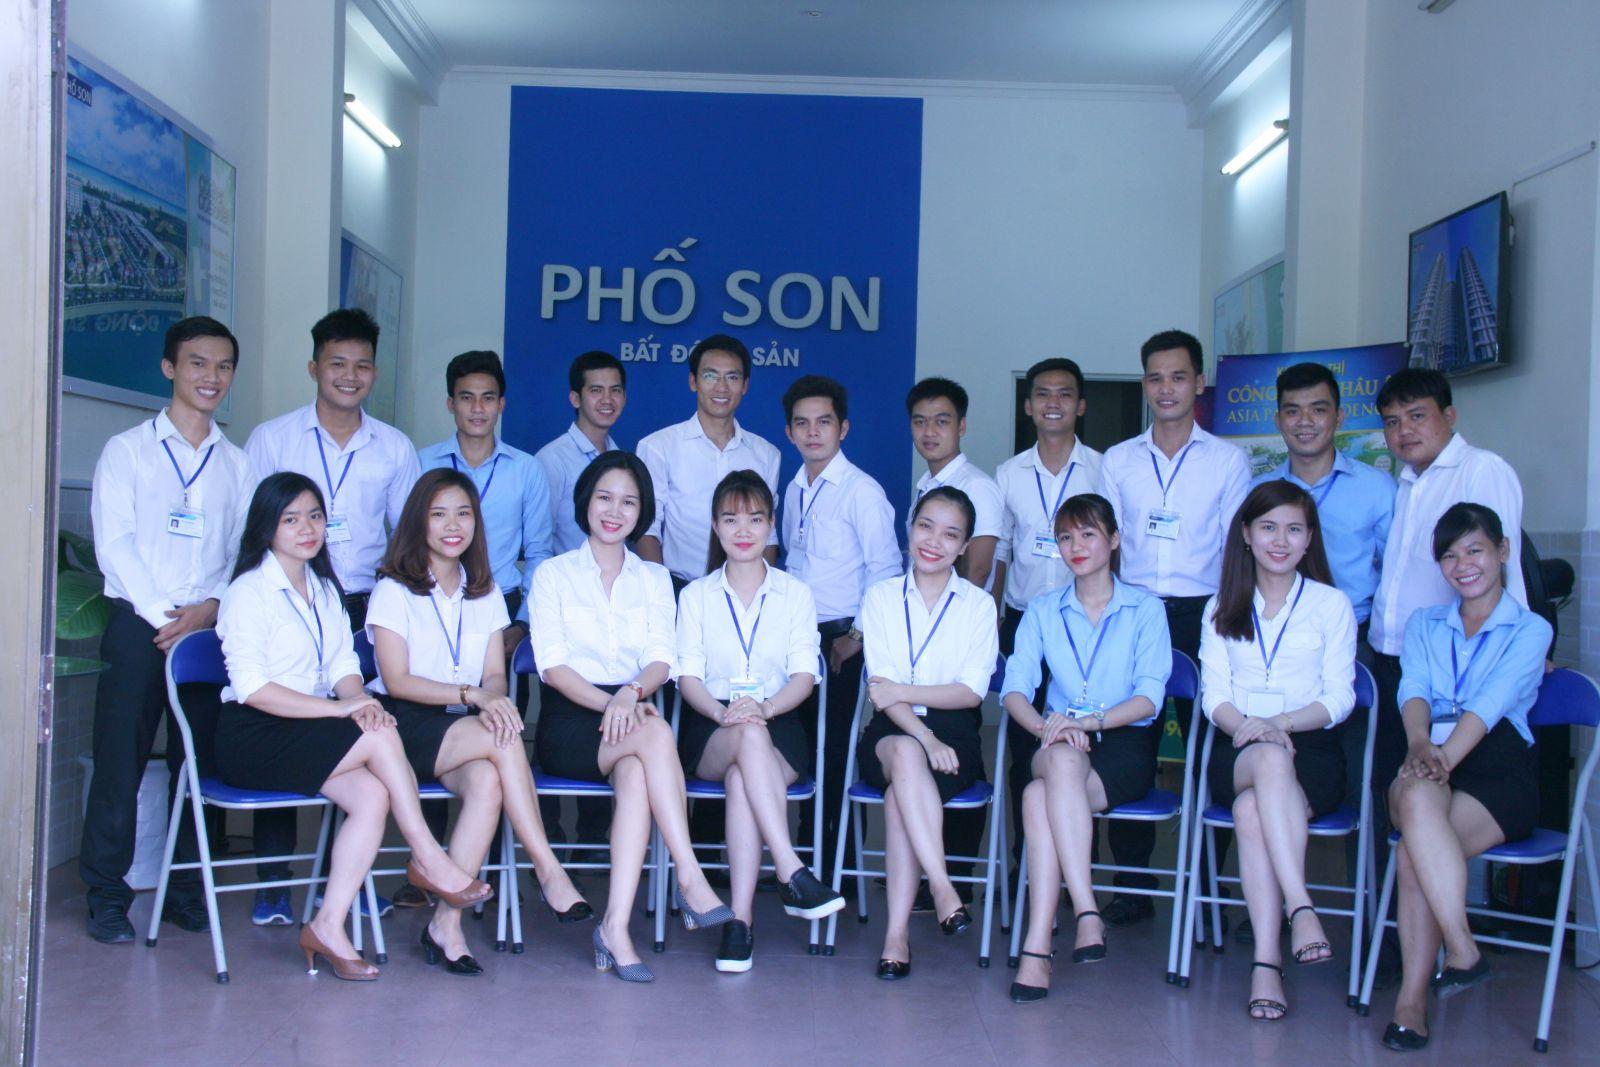 PHOSON-LOGO